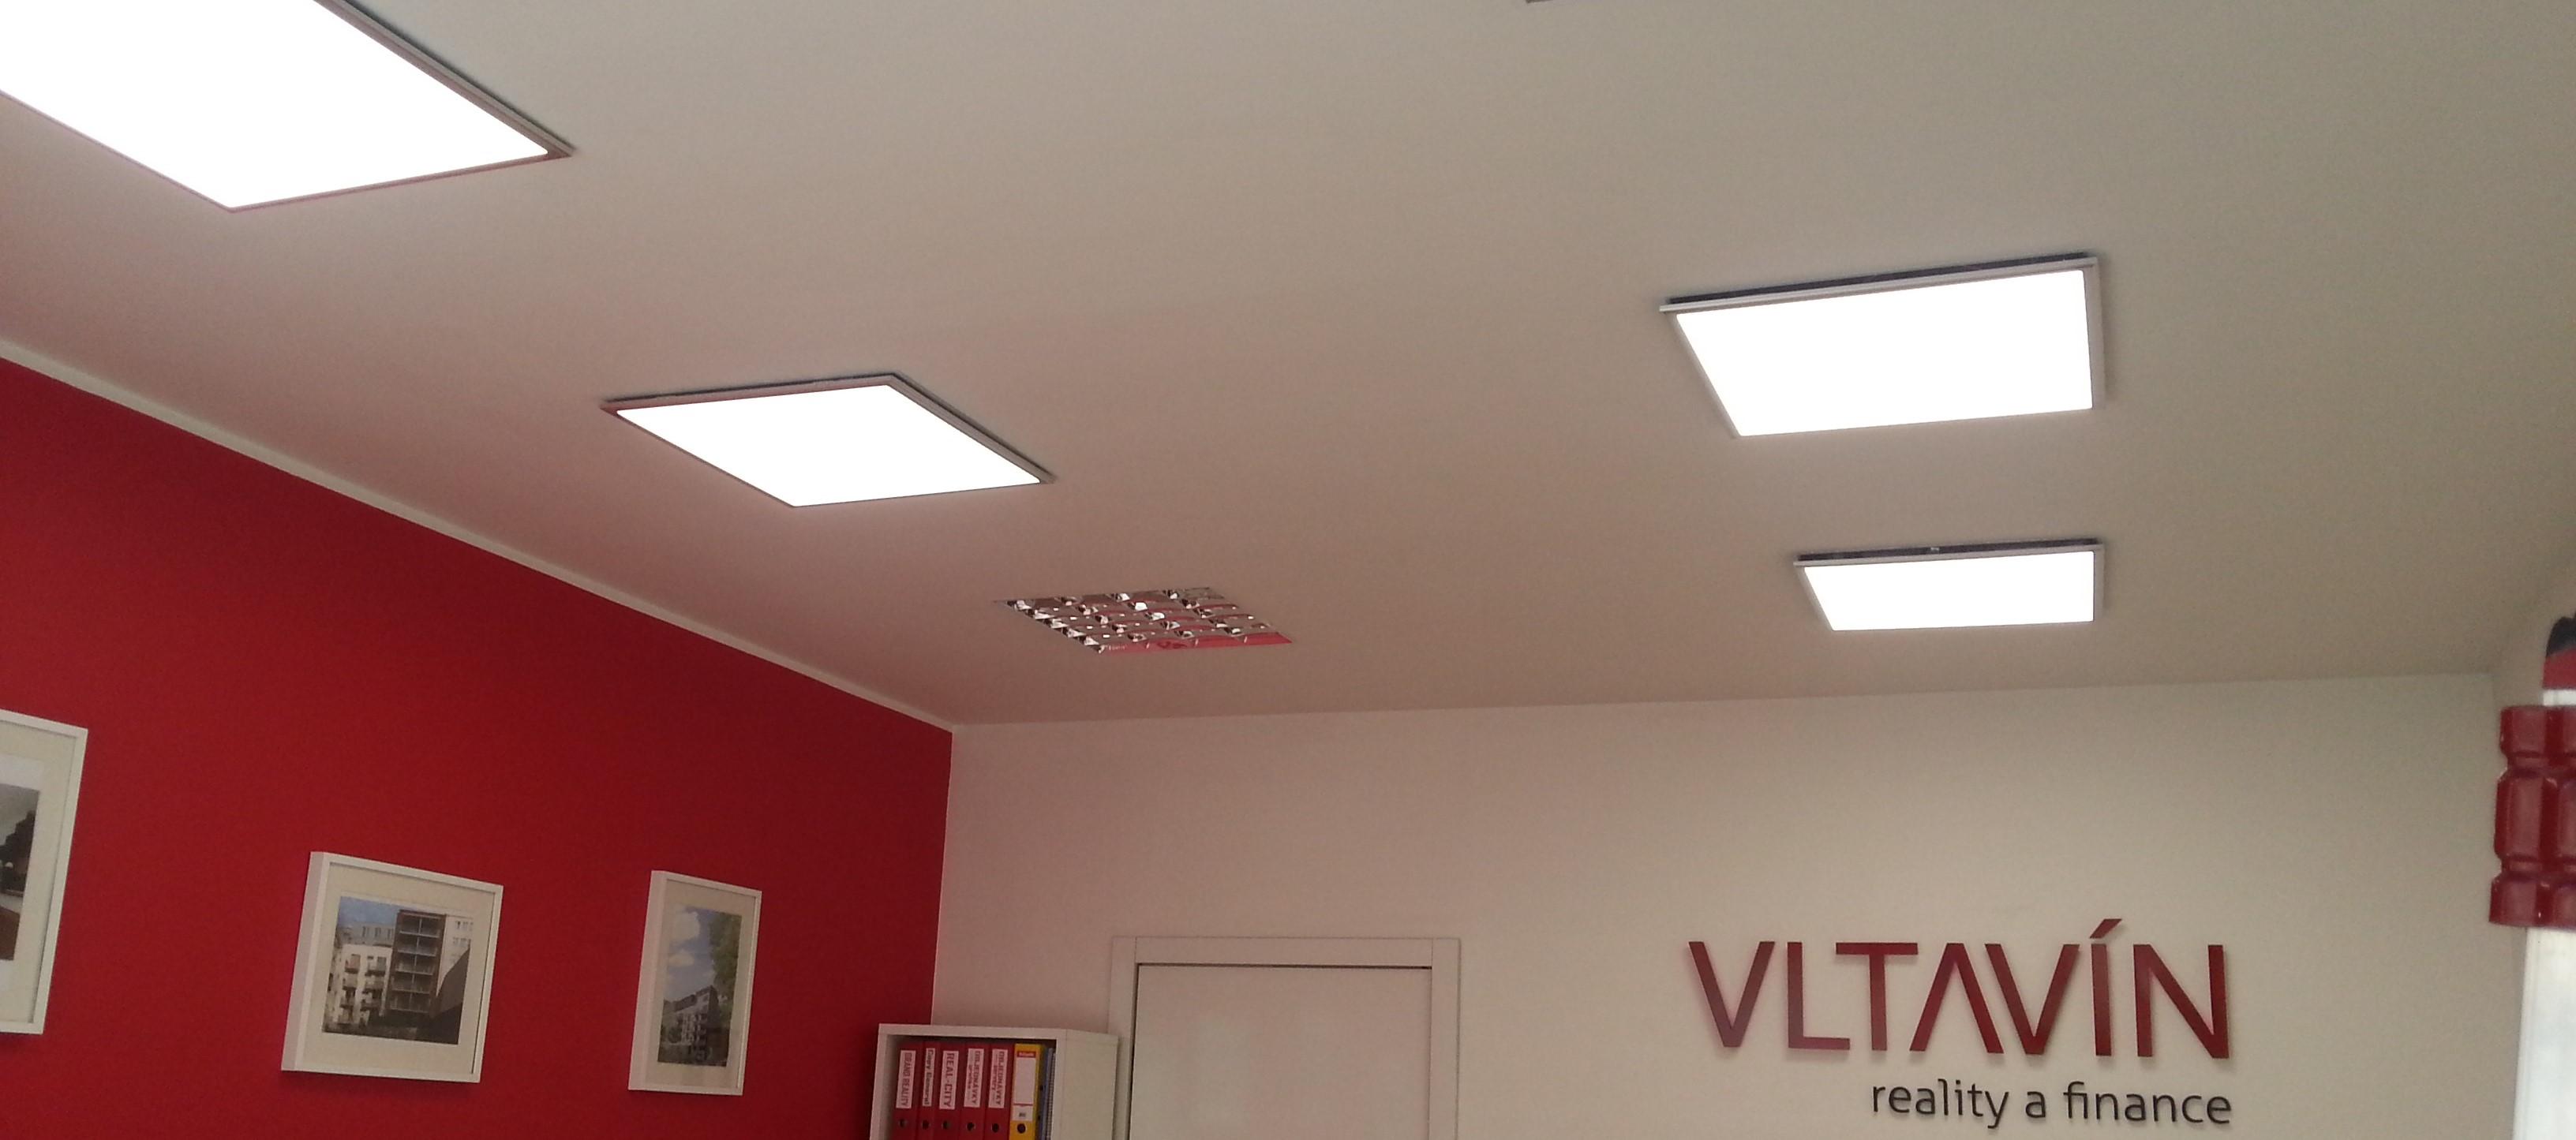 LED-osvetleni_realitni_kancelar_doporucena_intenzita_barva_pro_praci_poradit_s_vyberem_doporucit_LED-panel_stropni_ctverec_jak_povesit_svetlo_do_podhledu_sadrokartonu